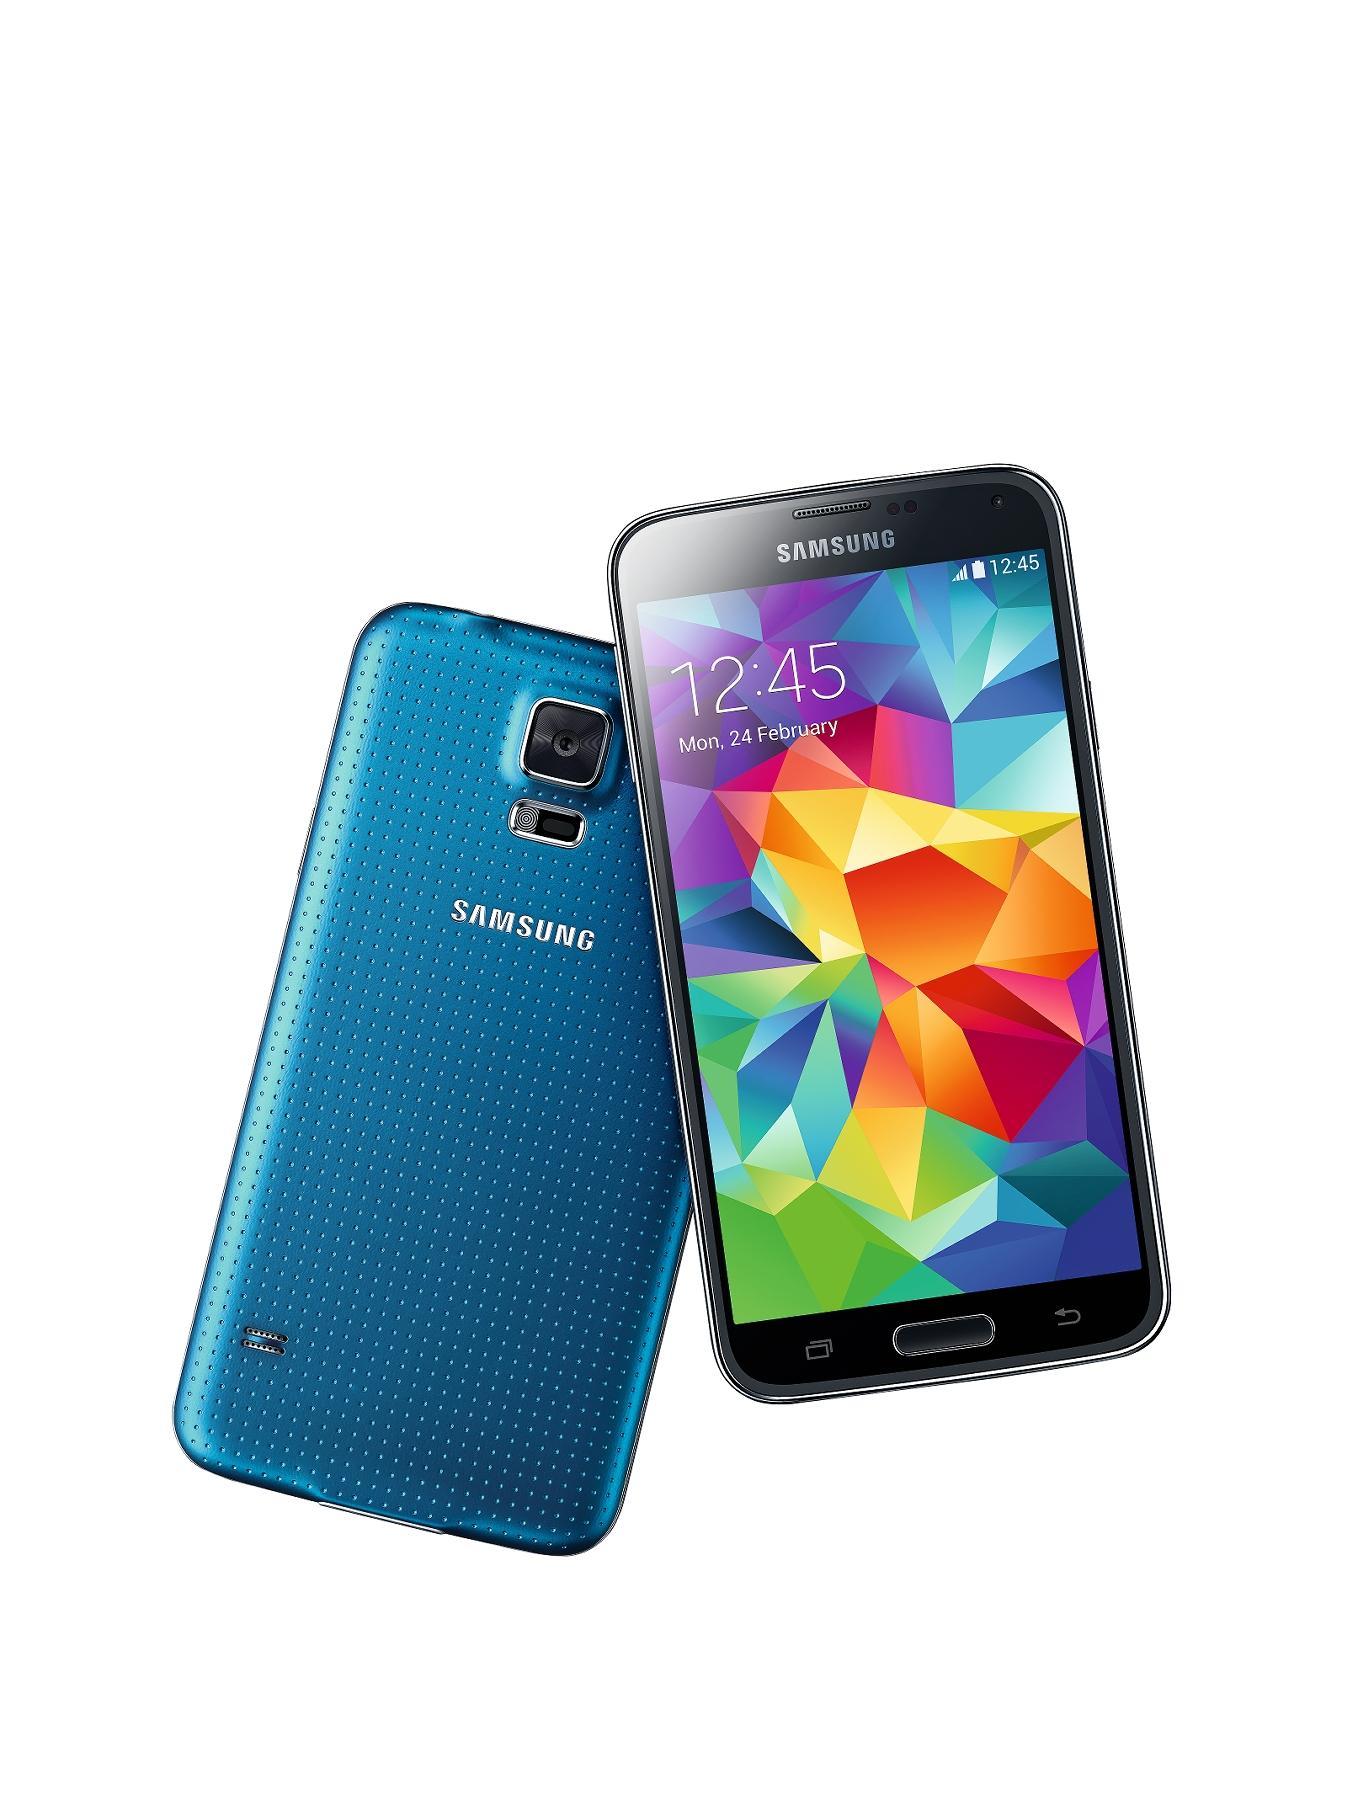 Samsung Galaxy S5 Smartphone - Blue